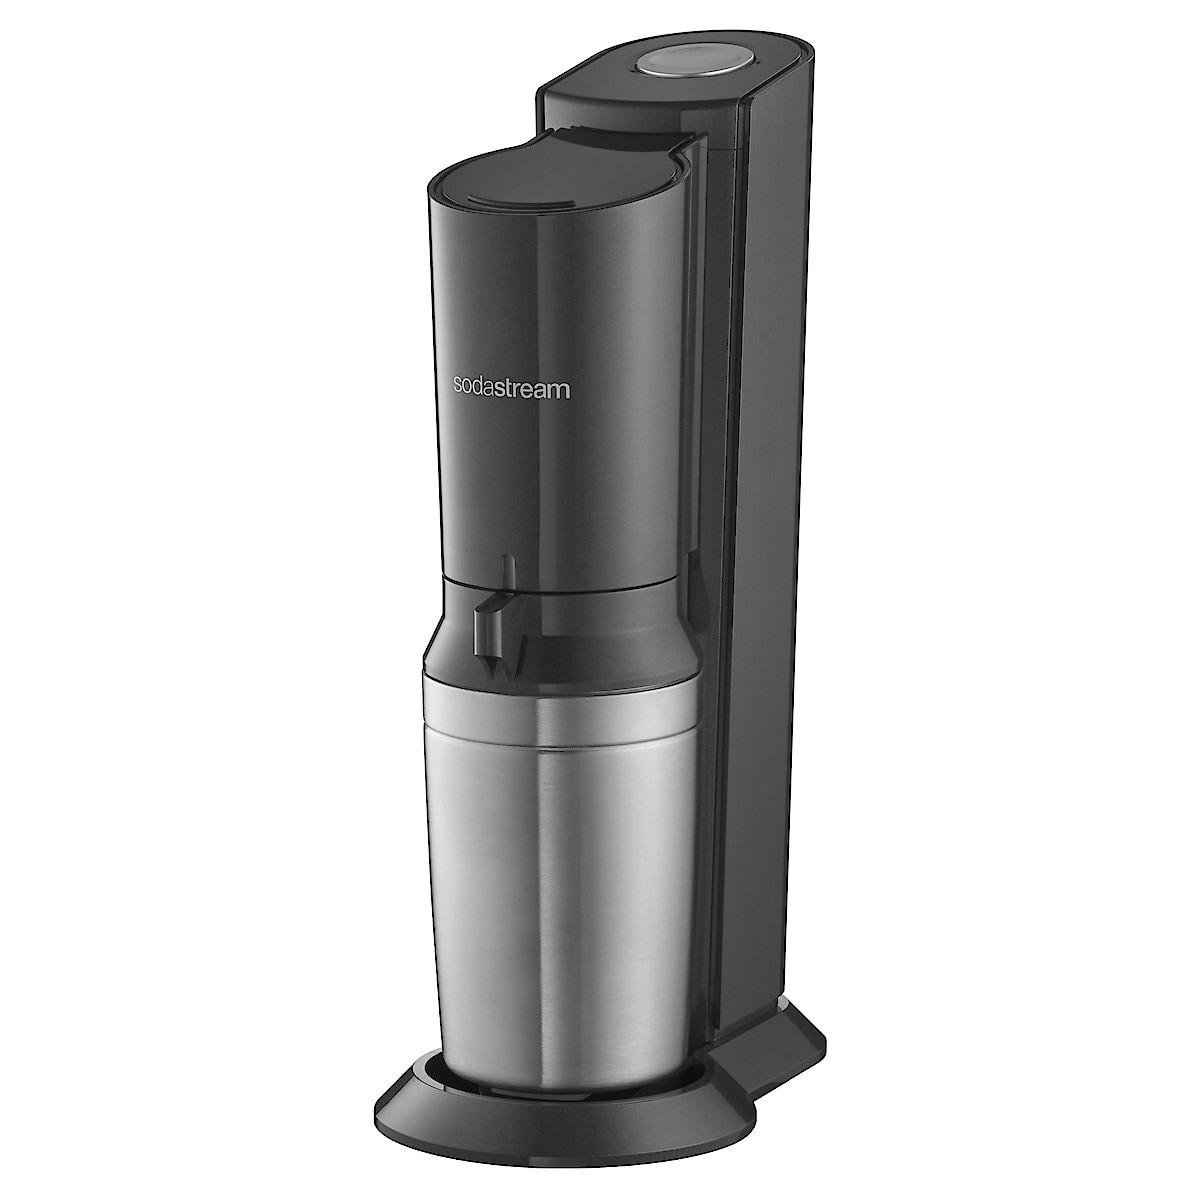 SodaStream Crystal, Black Metallic kullsyremaskin